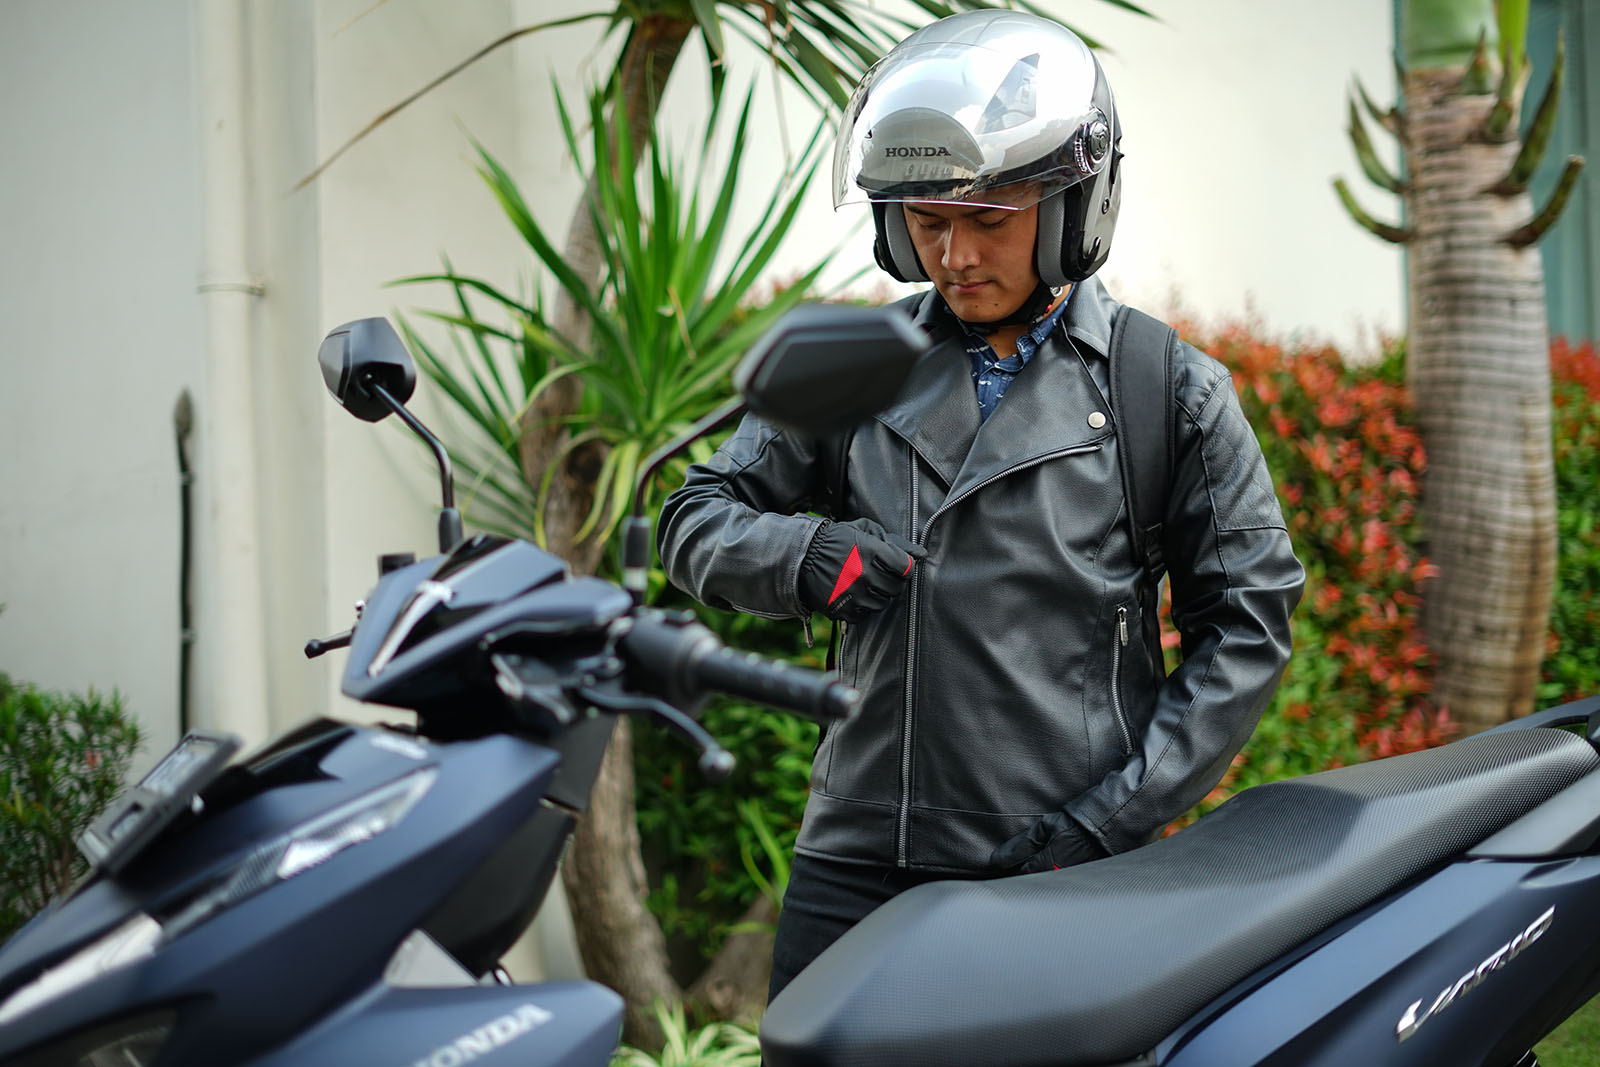 Mudik Pakai Sepeda Motor, Hindari Bawa Barang Berlebih